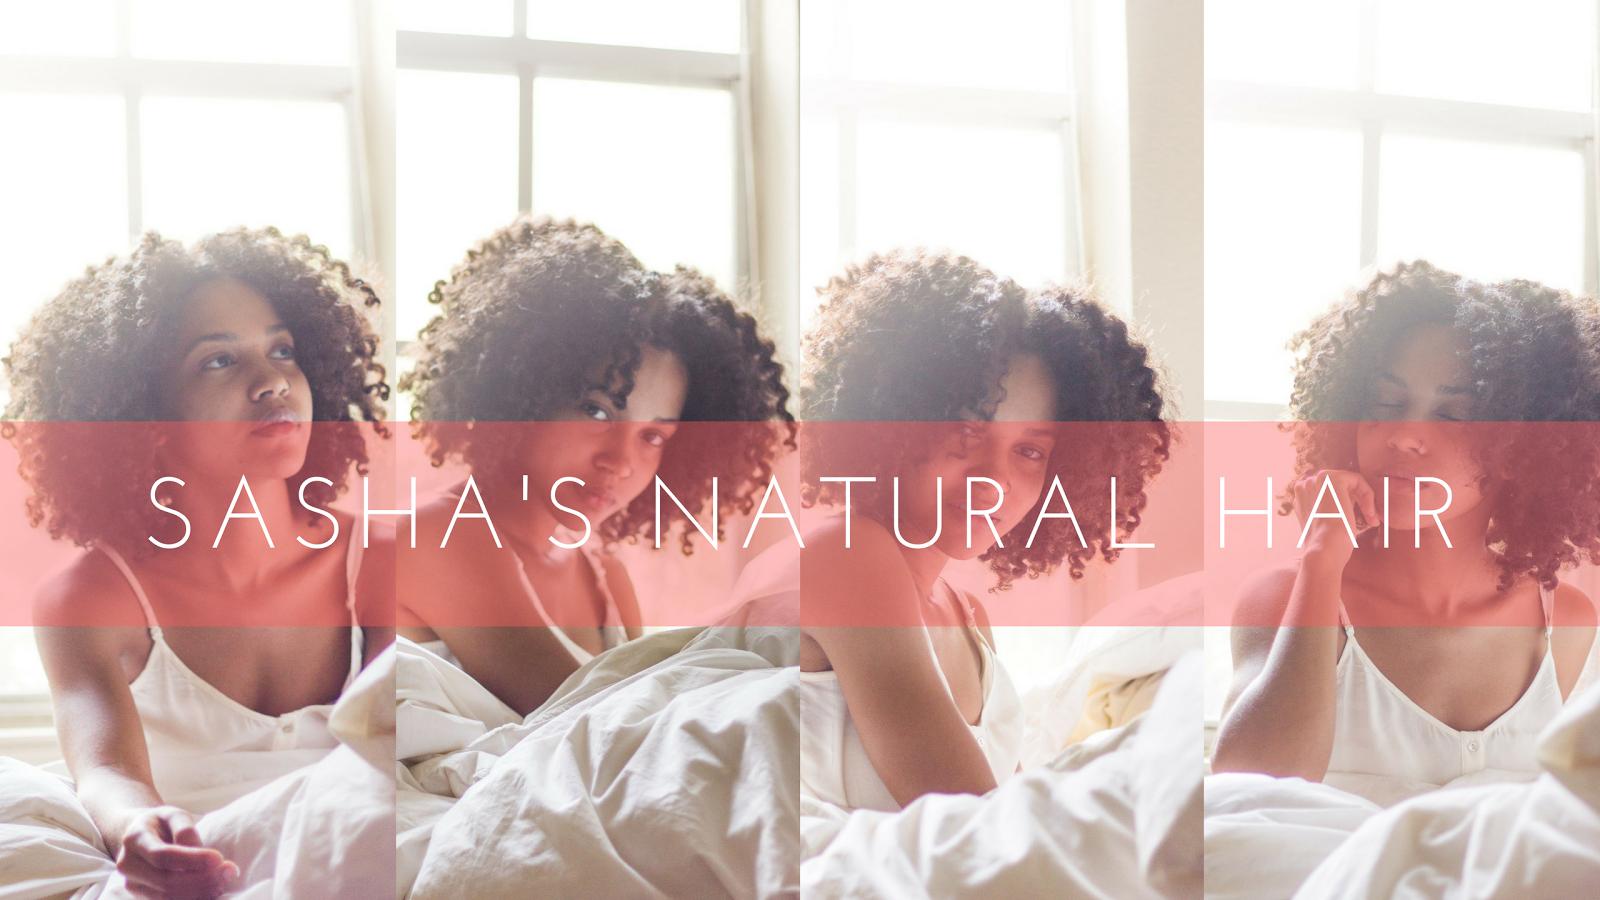 Sasha's Natural Hair